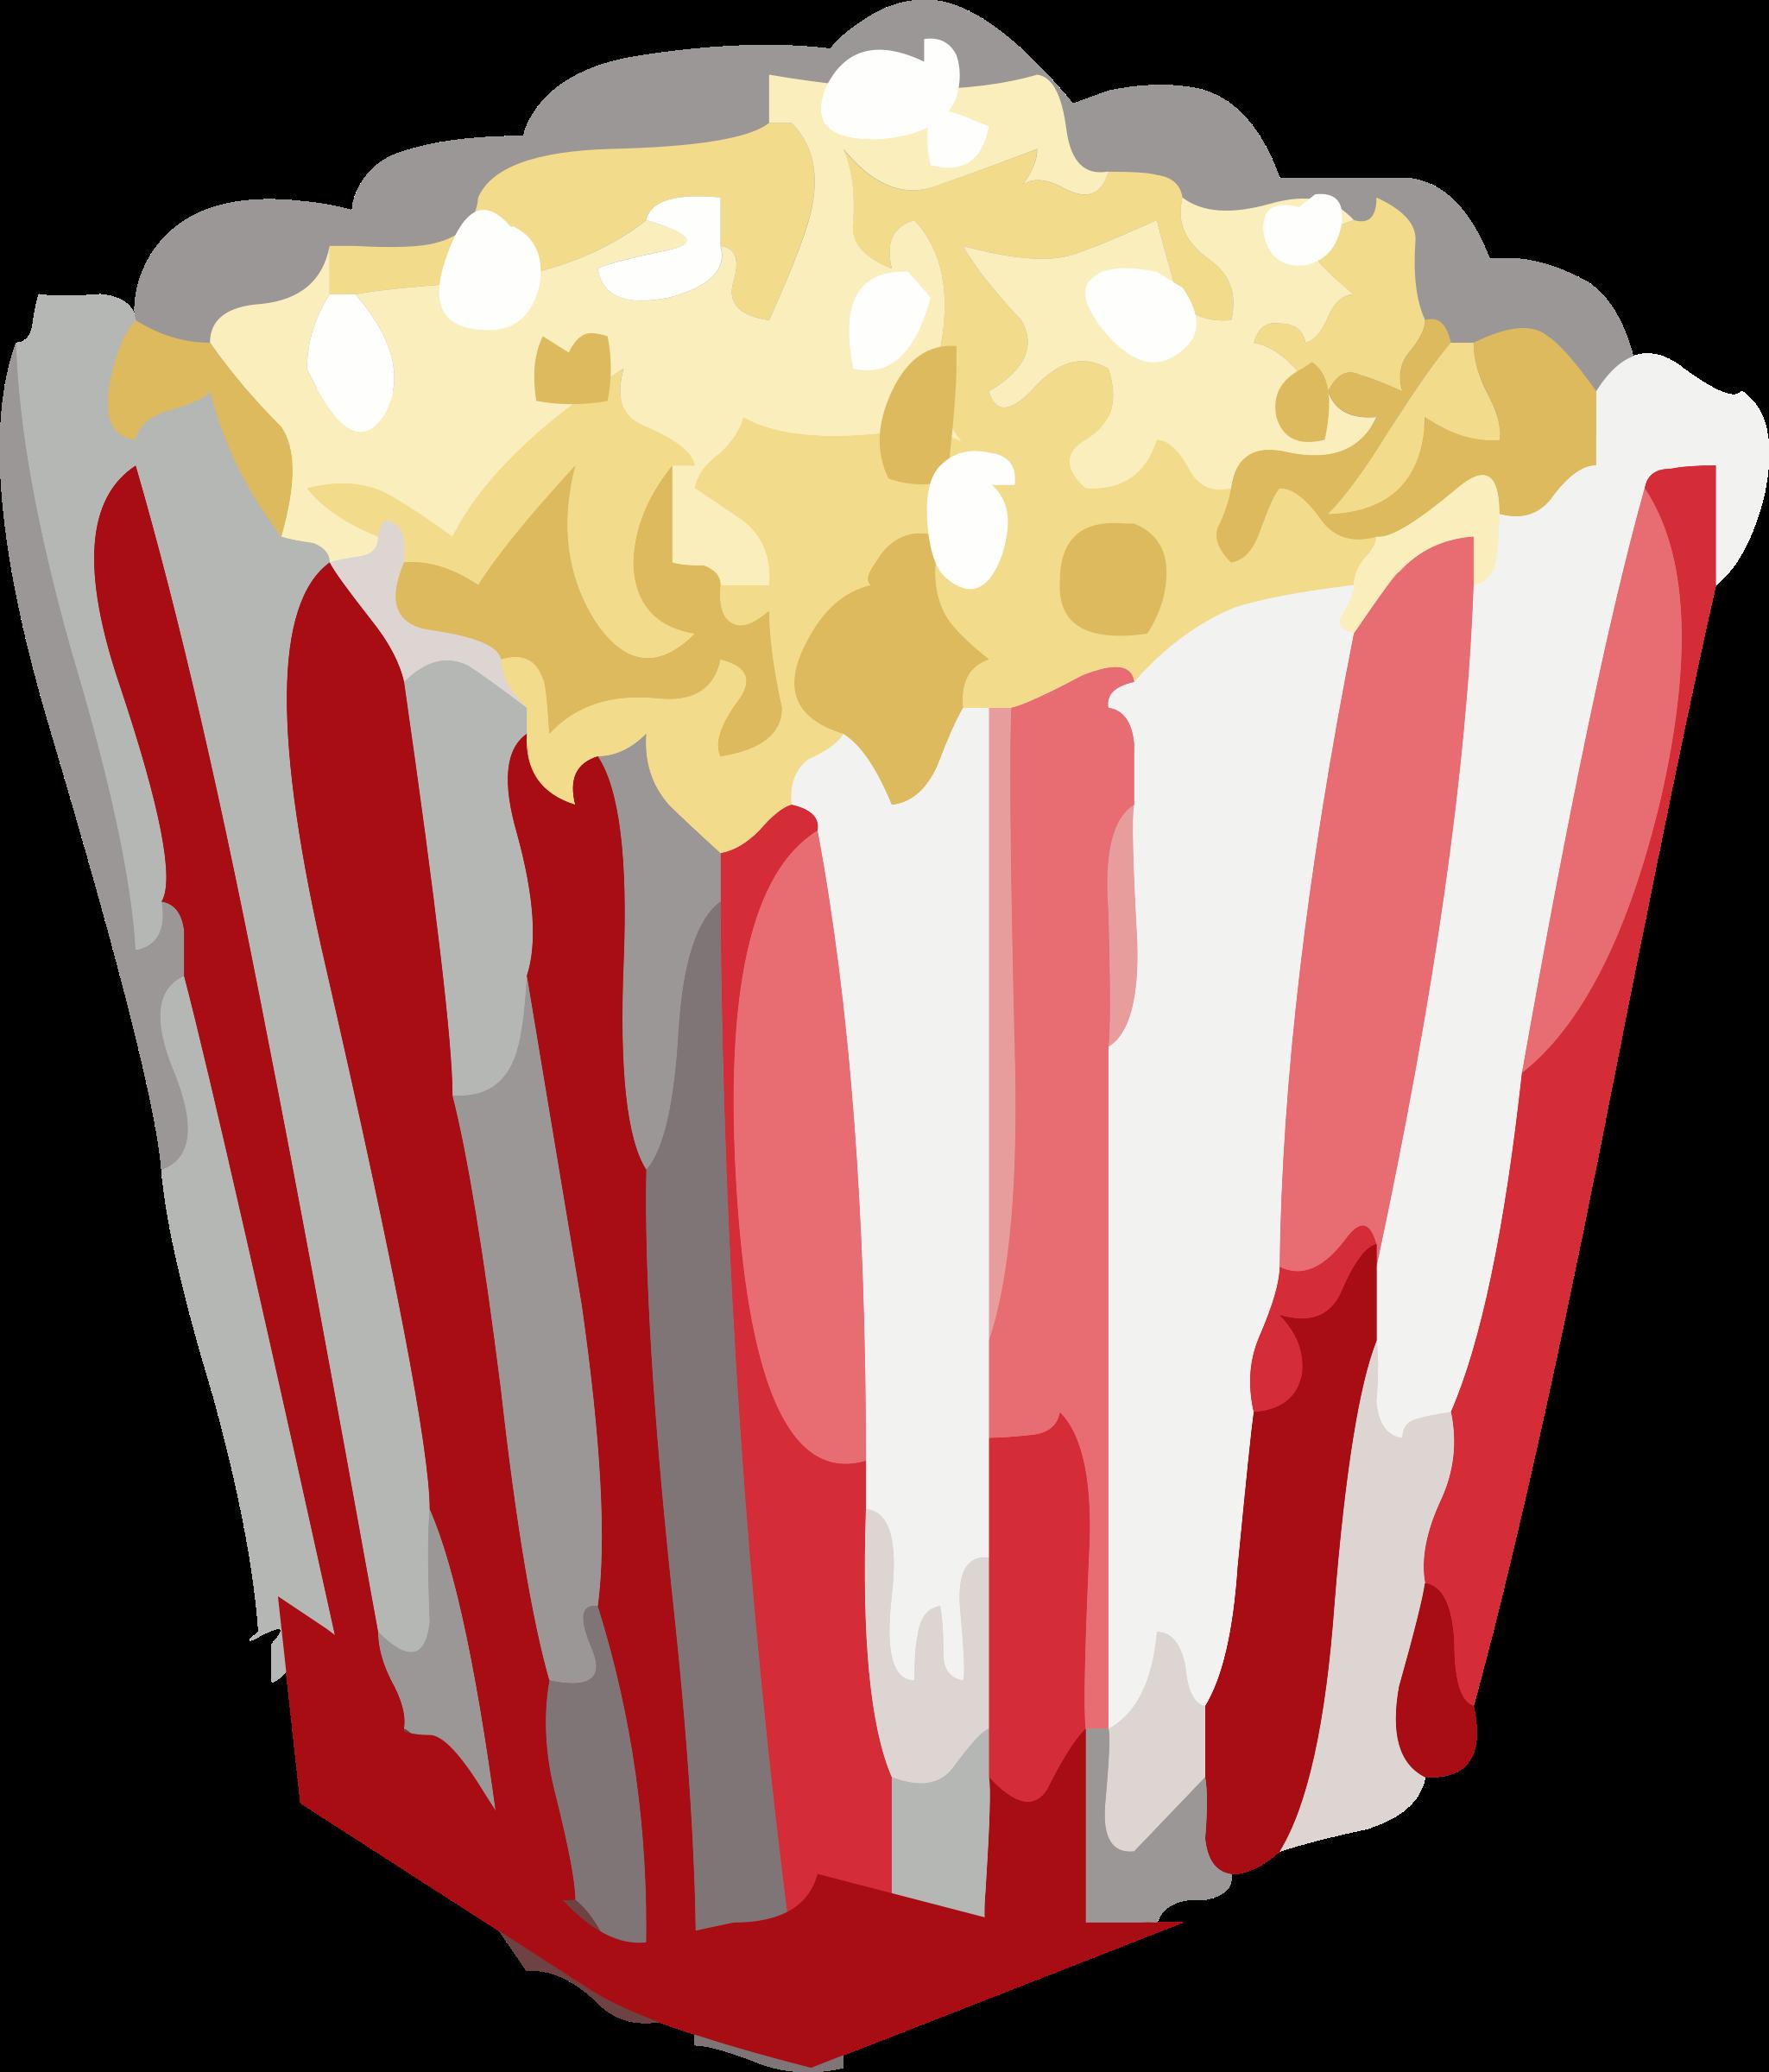 Movies spilled popcorn